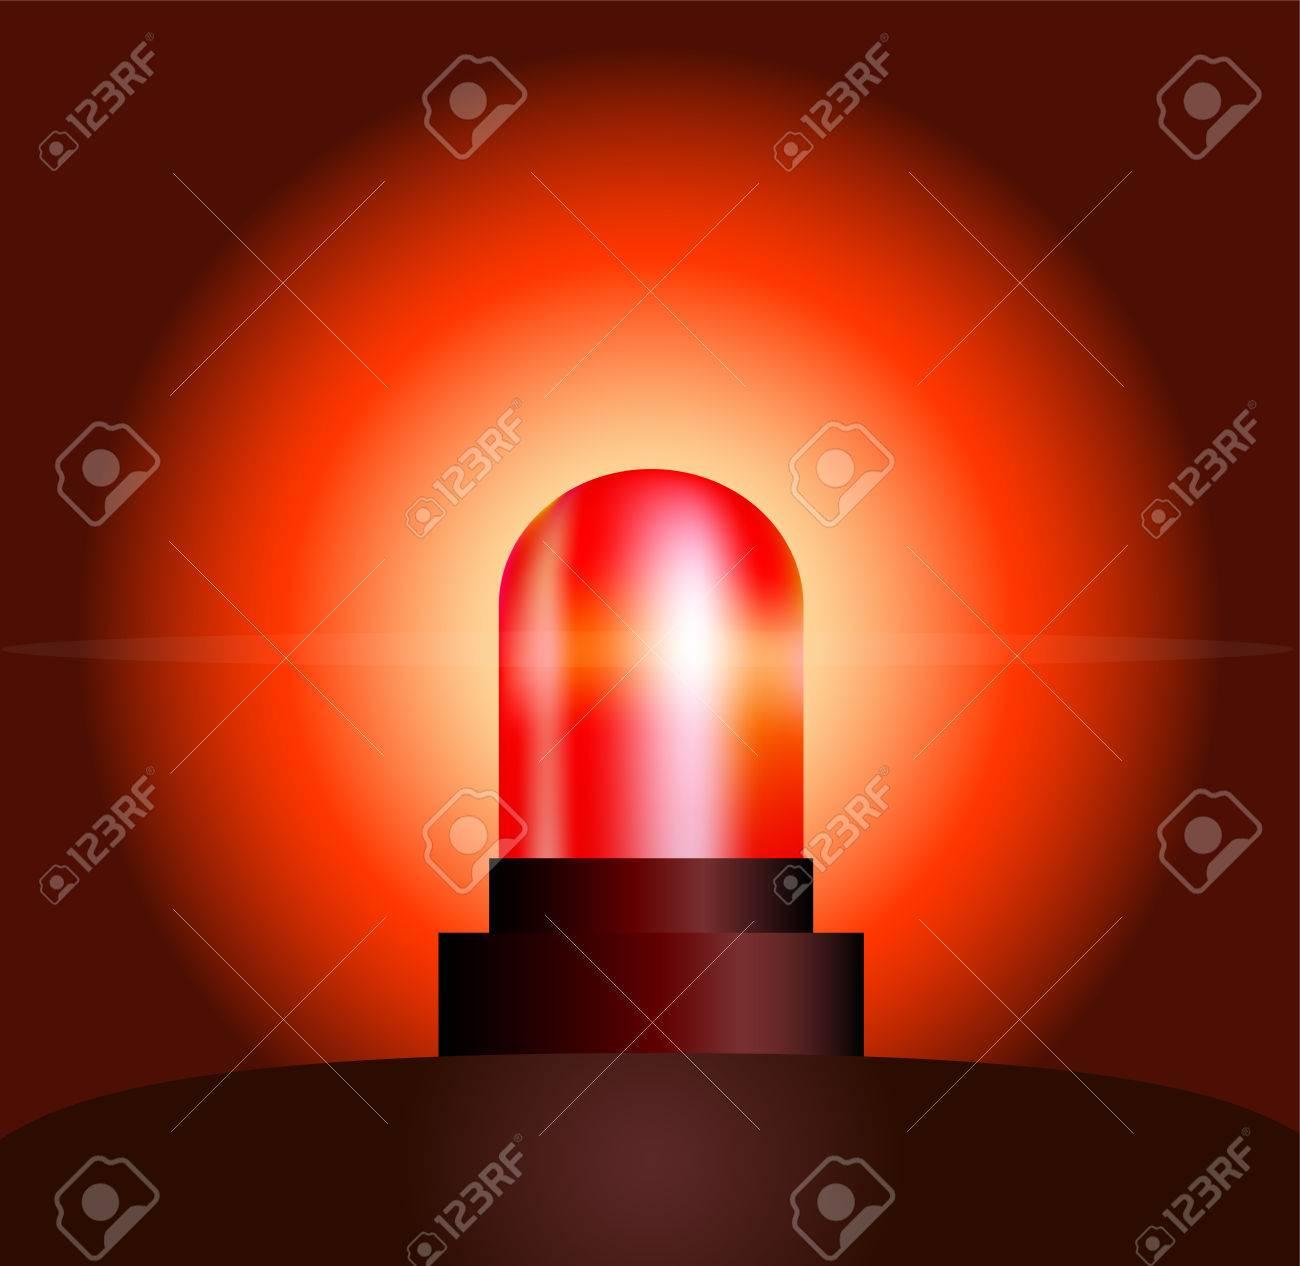 Garishly shining red light, that warns of danger Stock Vector - 24541207